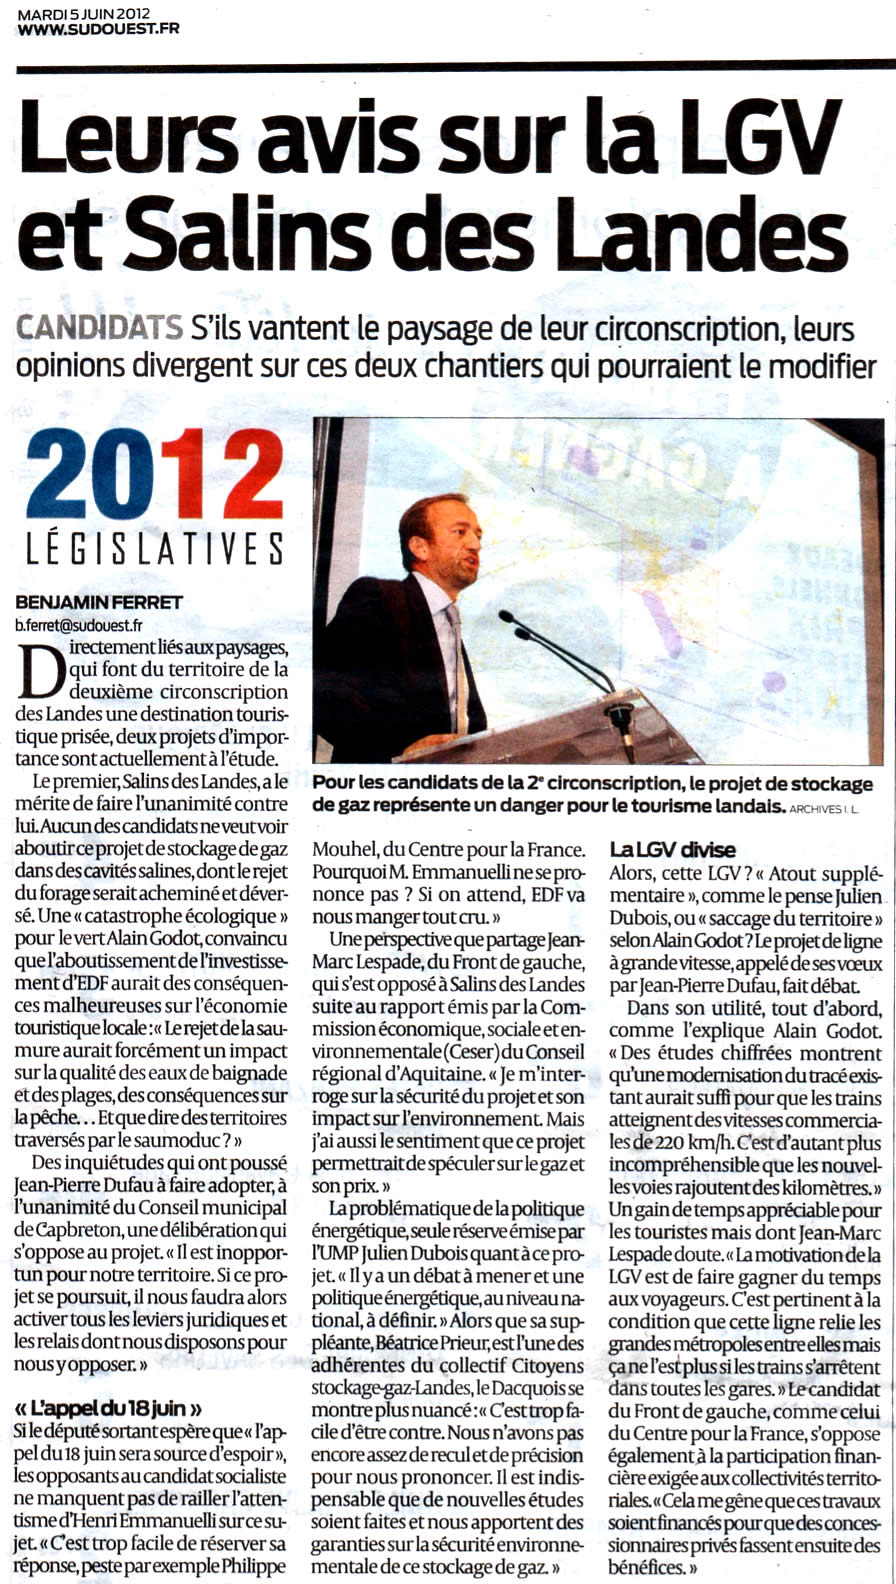 Candidats stockege-gaz-landes.net contre Salins des Lande